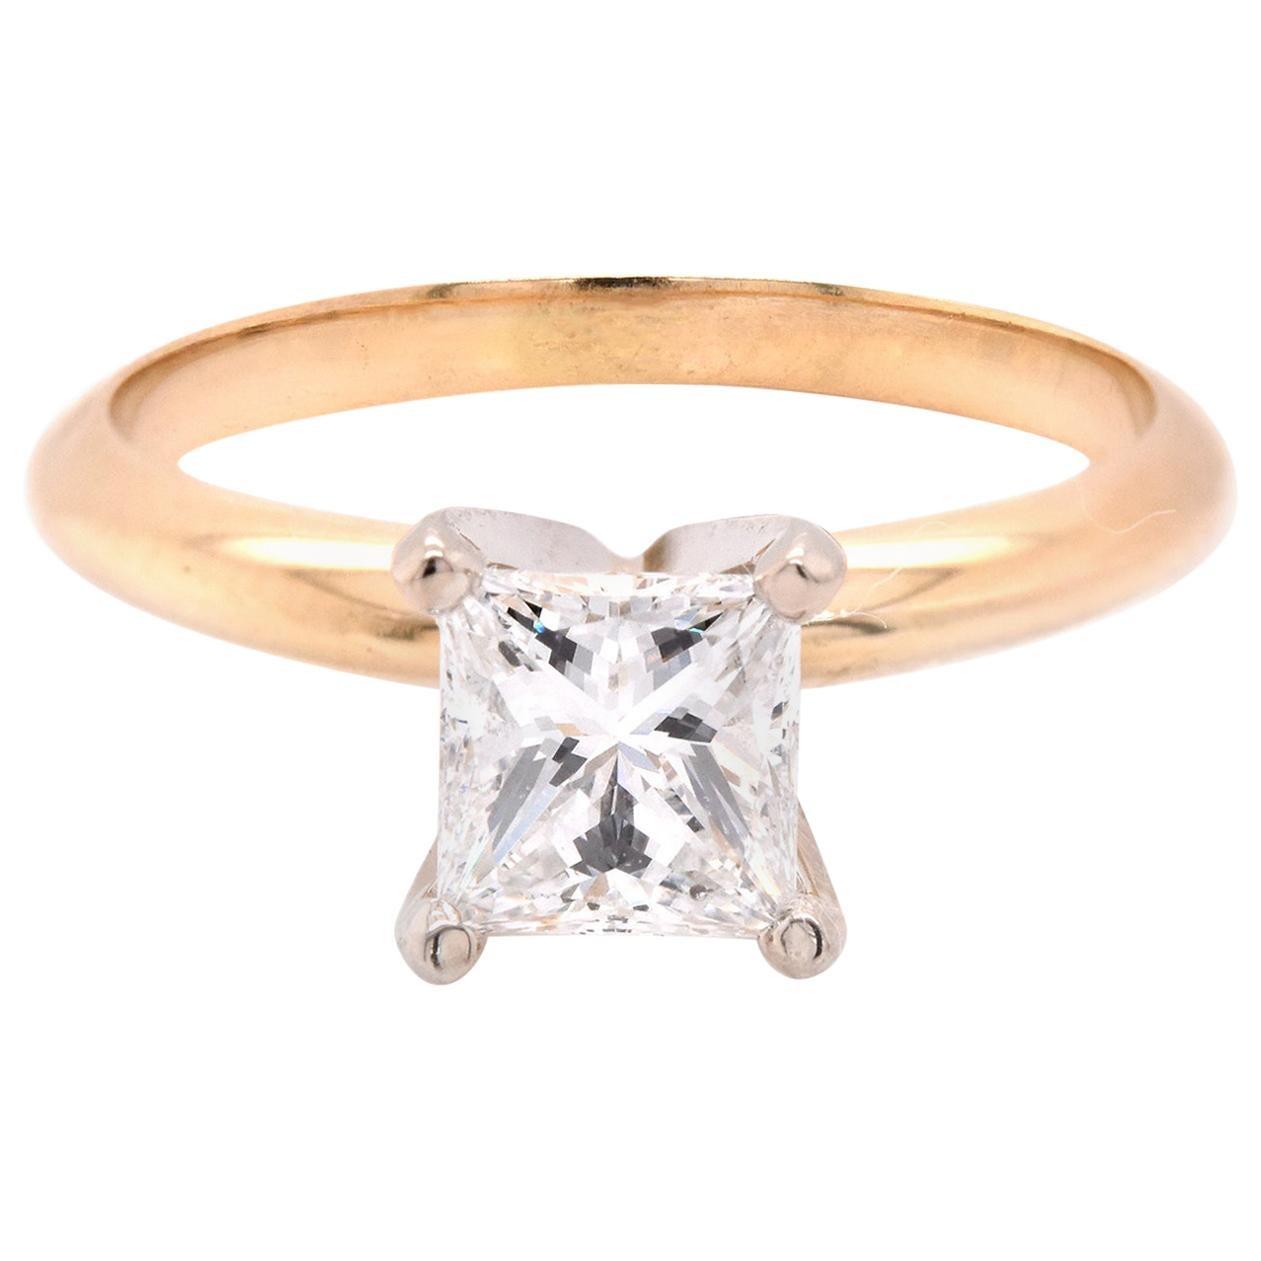 14 Karat Yellow Gold Solitaire Diamond Engagement Ring